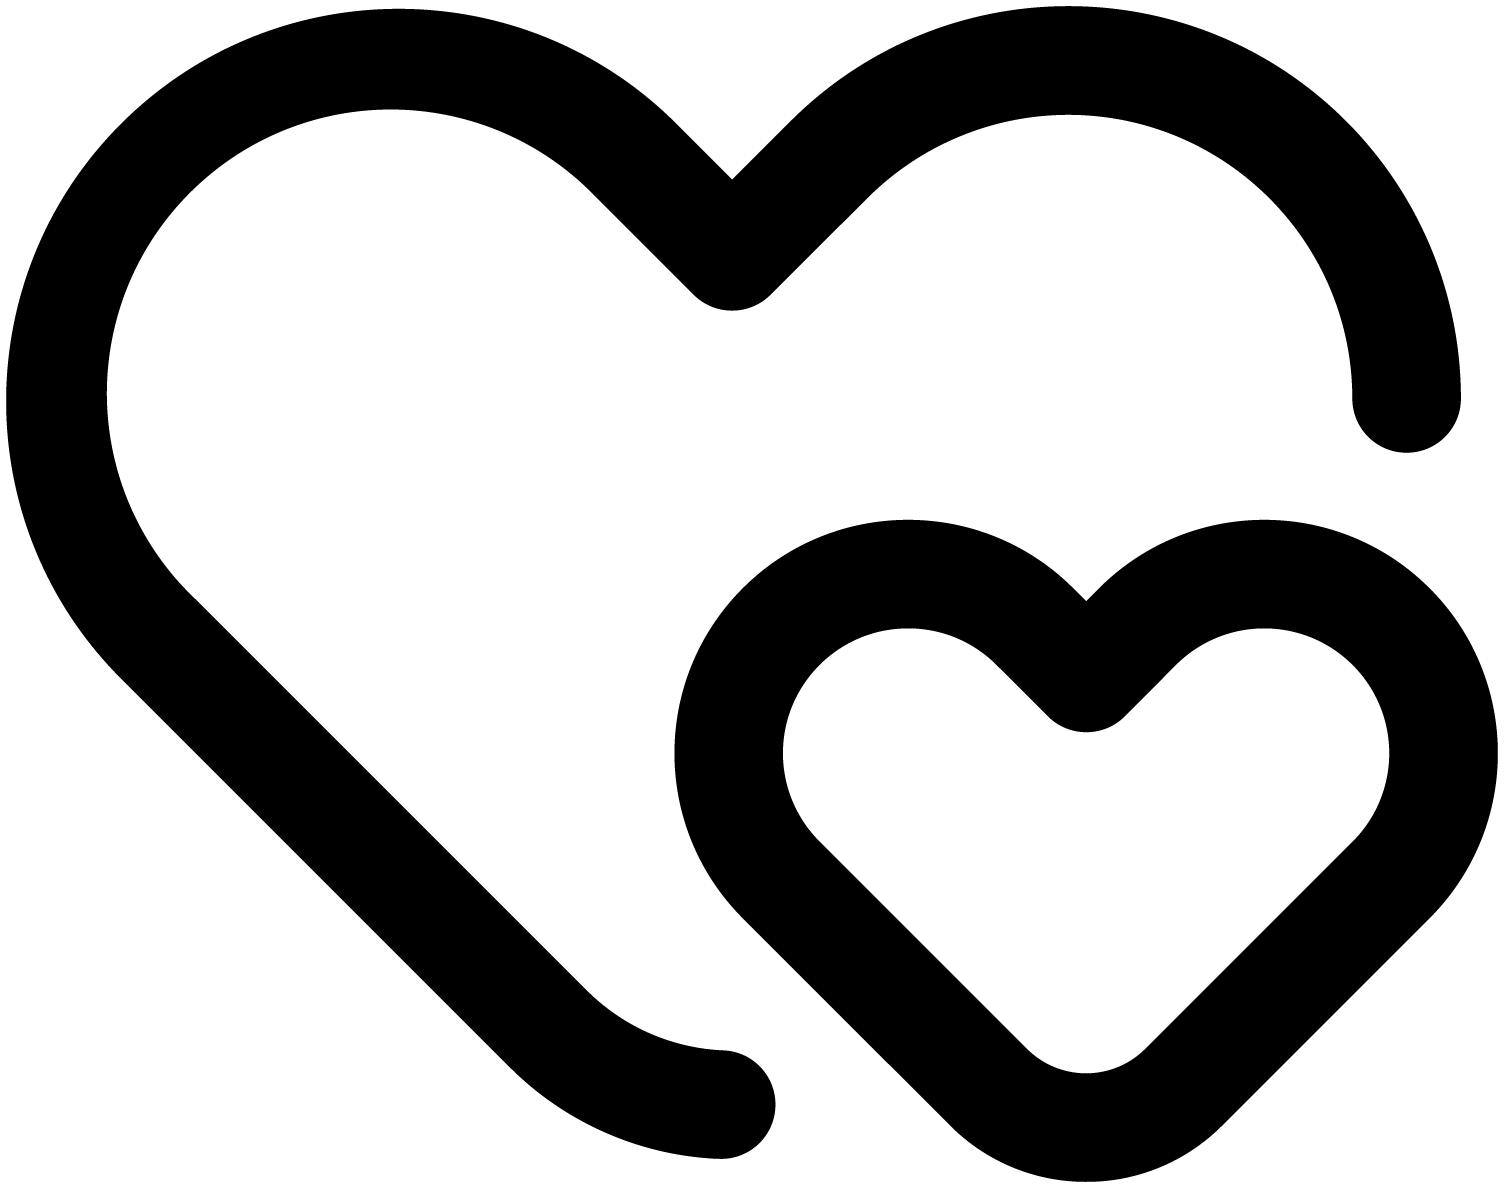 Aretan Health Icon Image